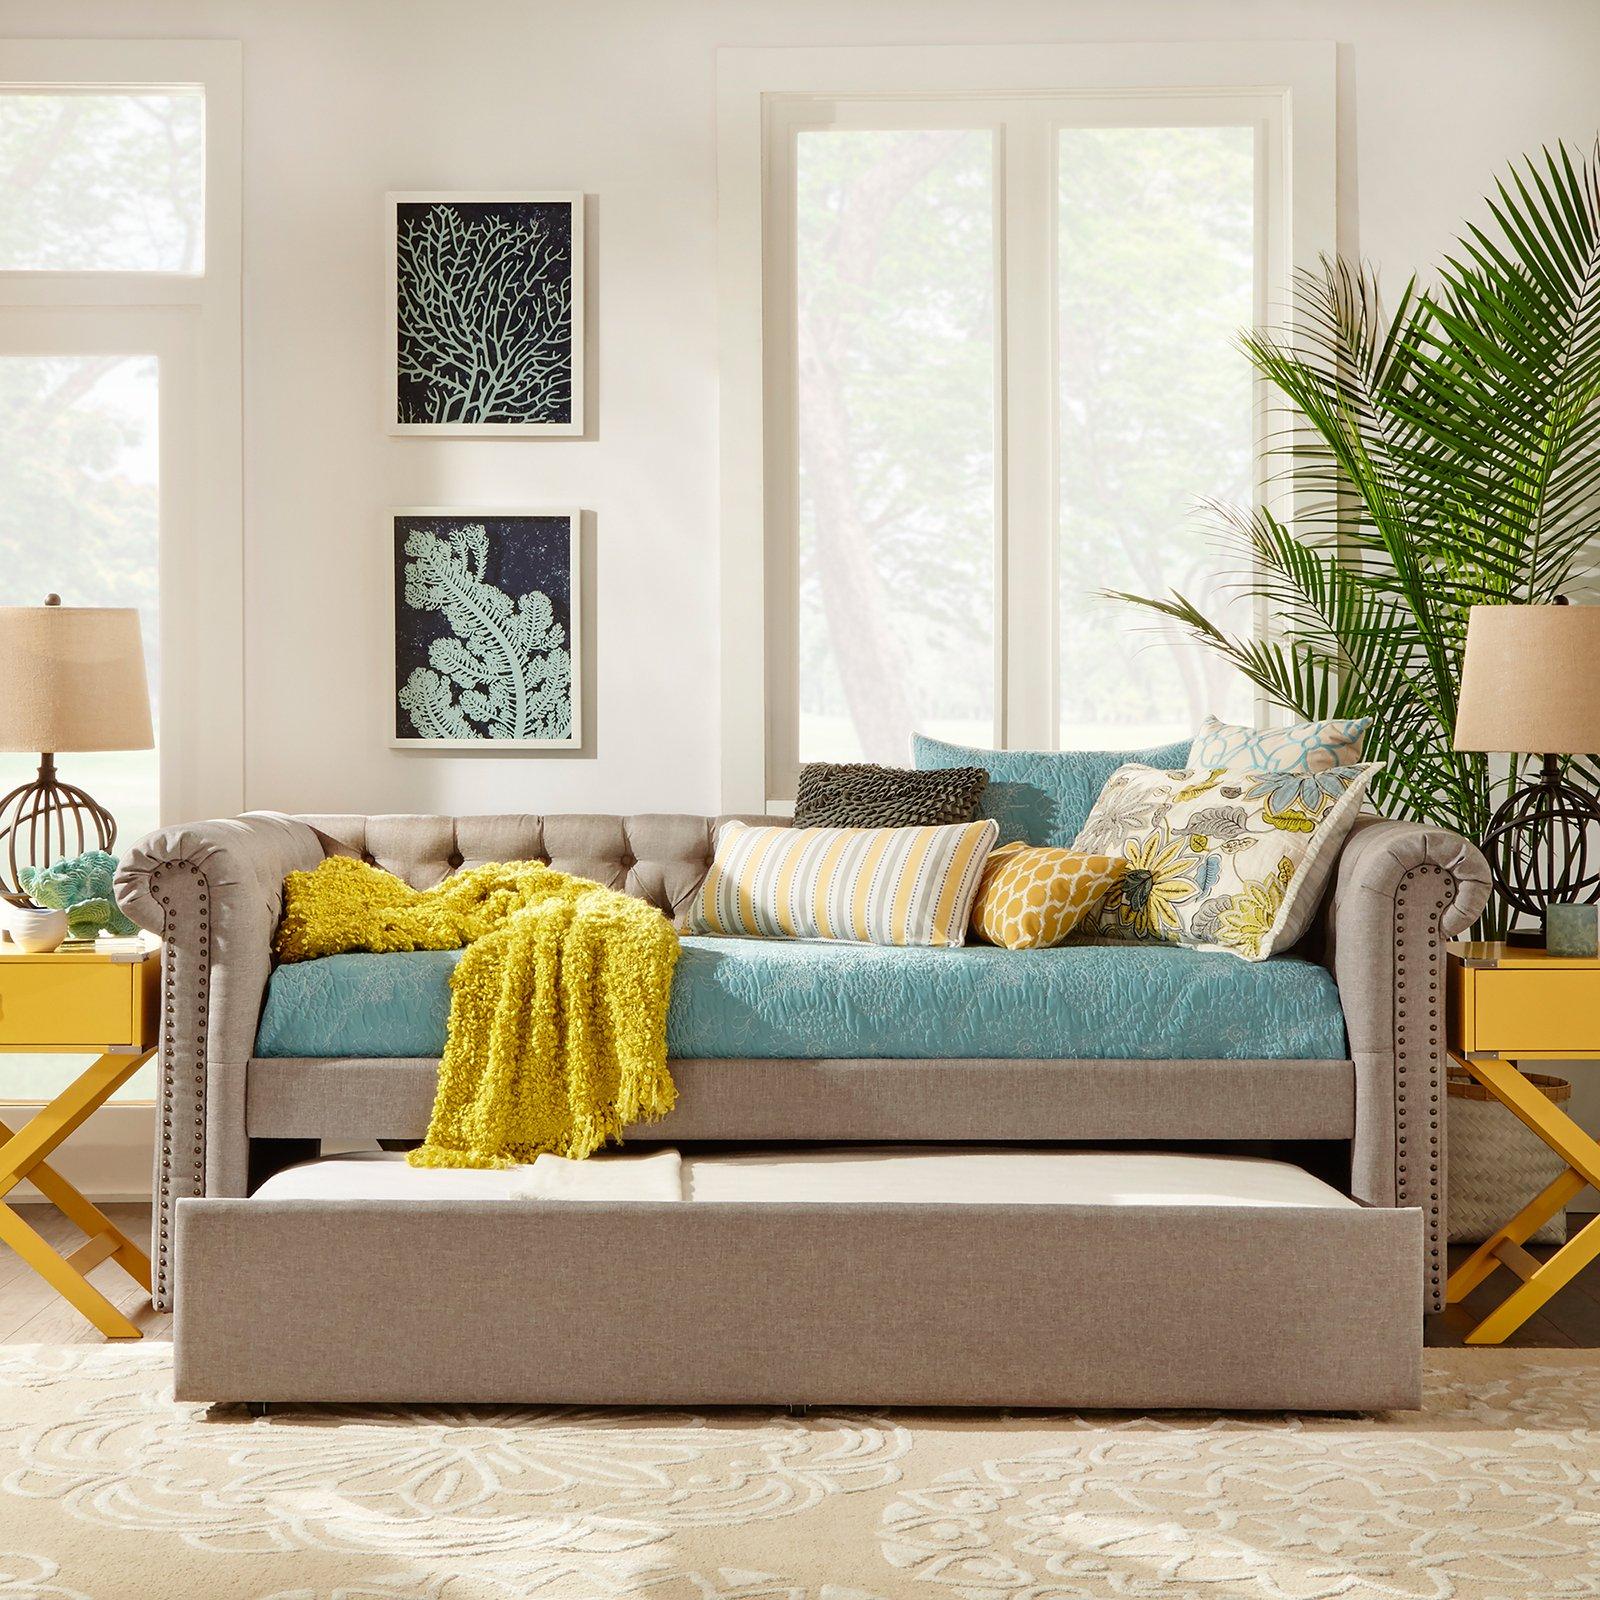 Раздвижной диван тахта